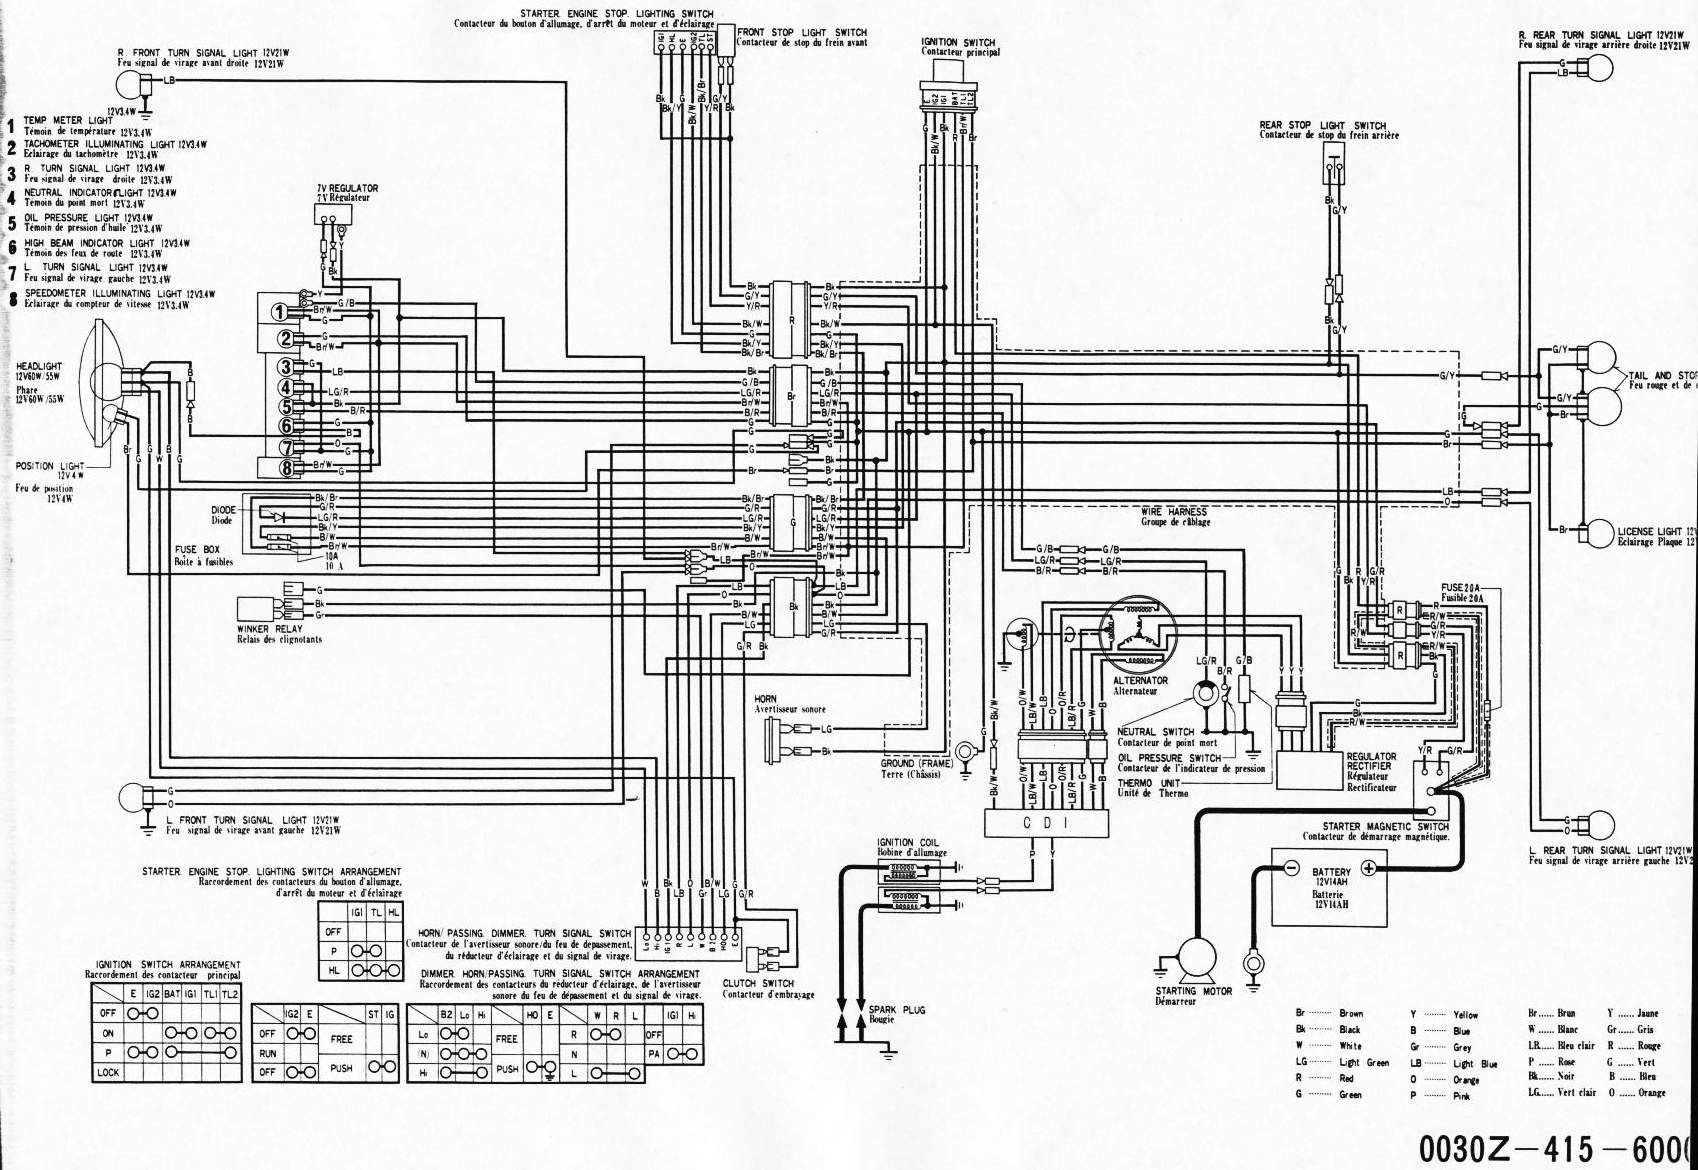 Awe Inspiring Xr250L Wiring Diagram Basic Electronics Wiring Diagram Wiring 101 Mecadwellnesstrialsorg